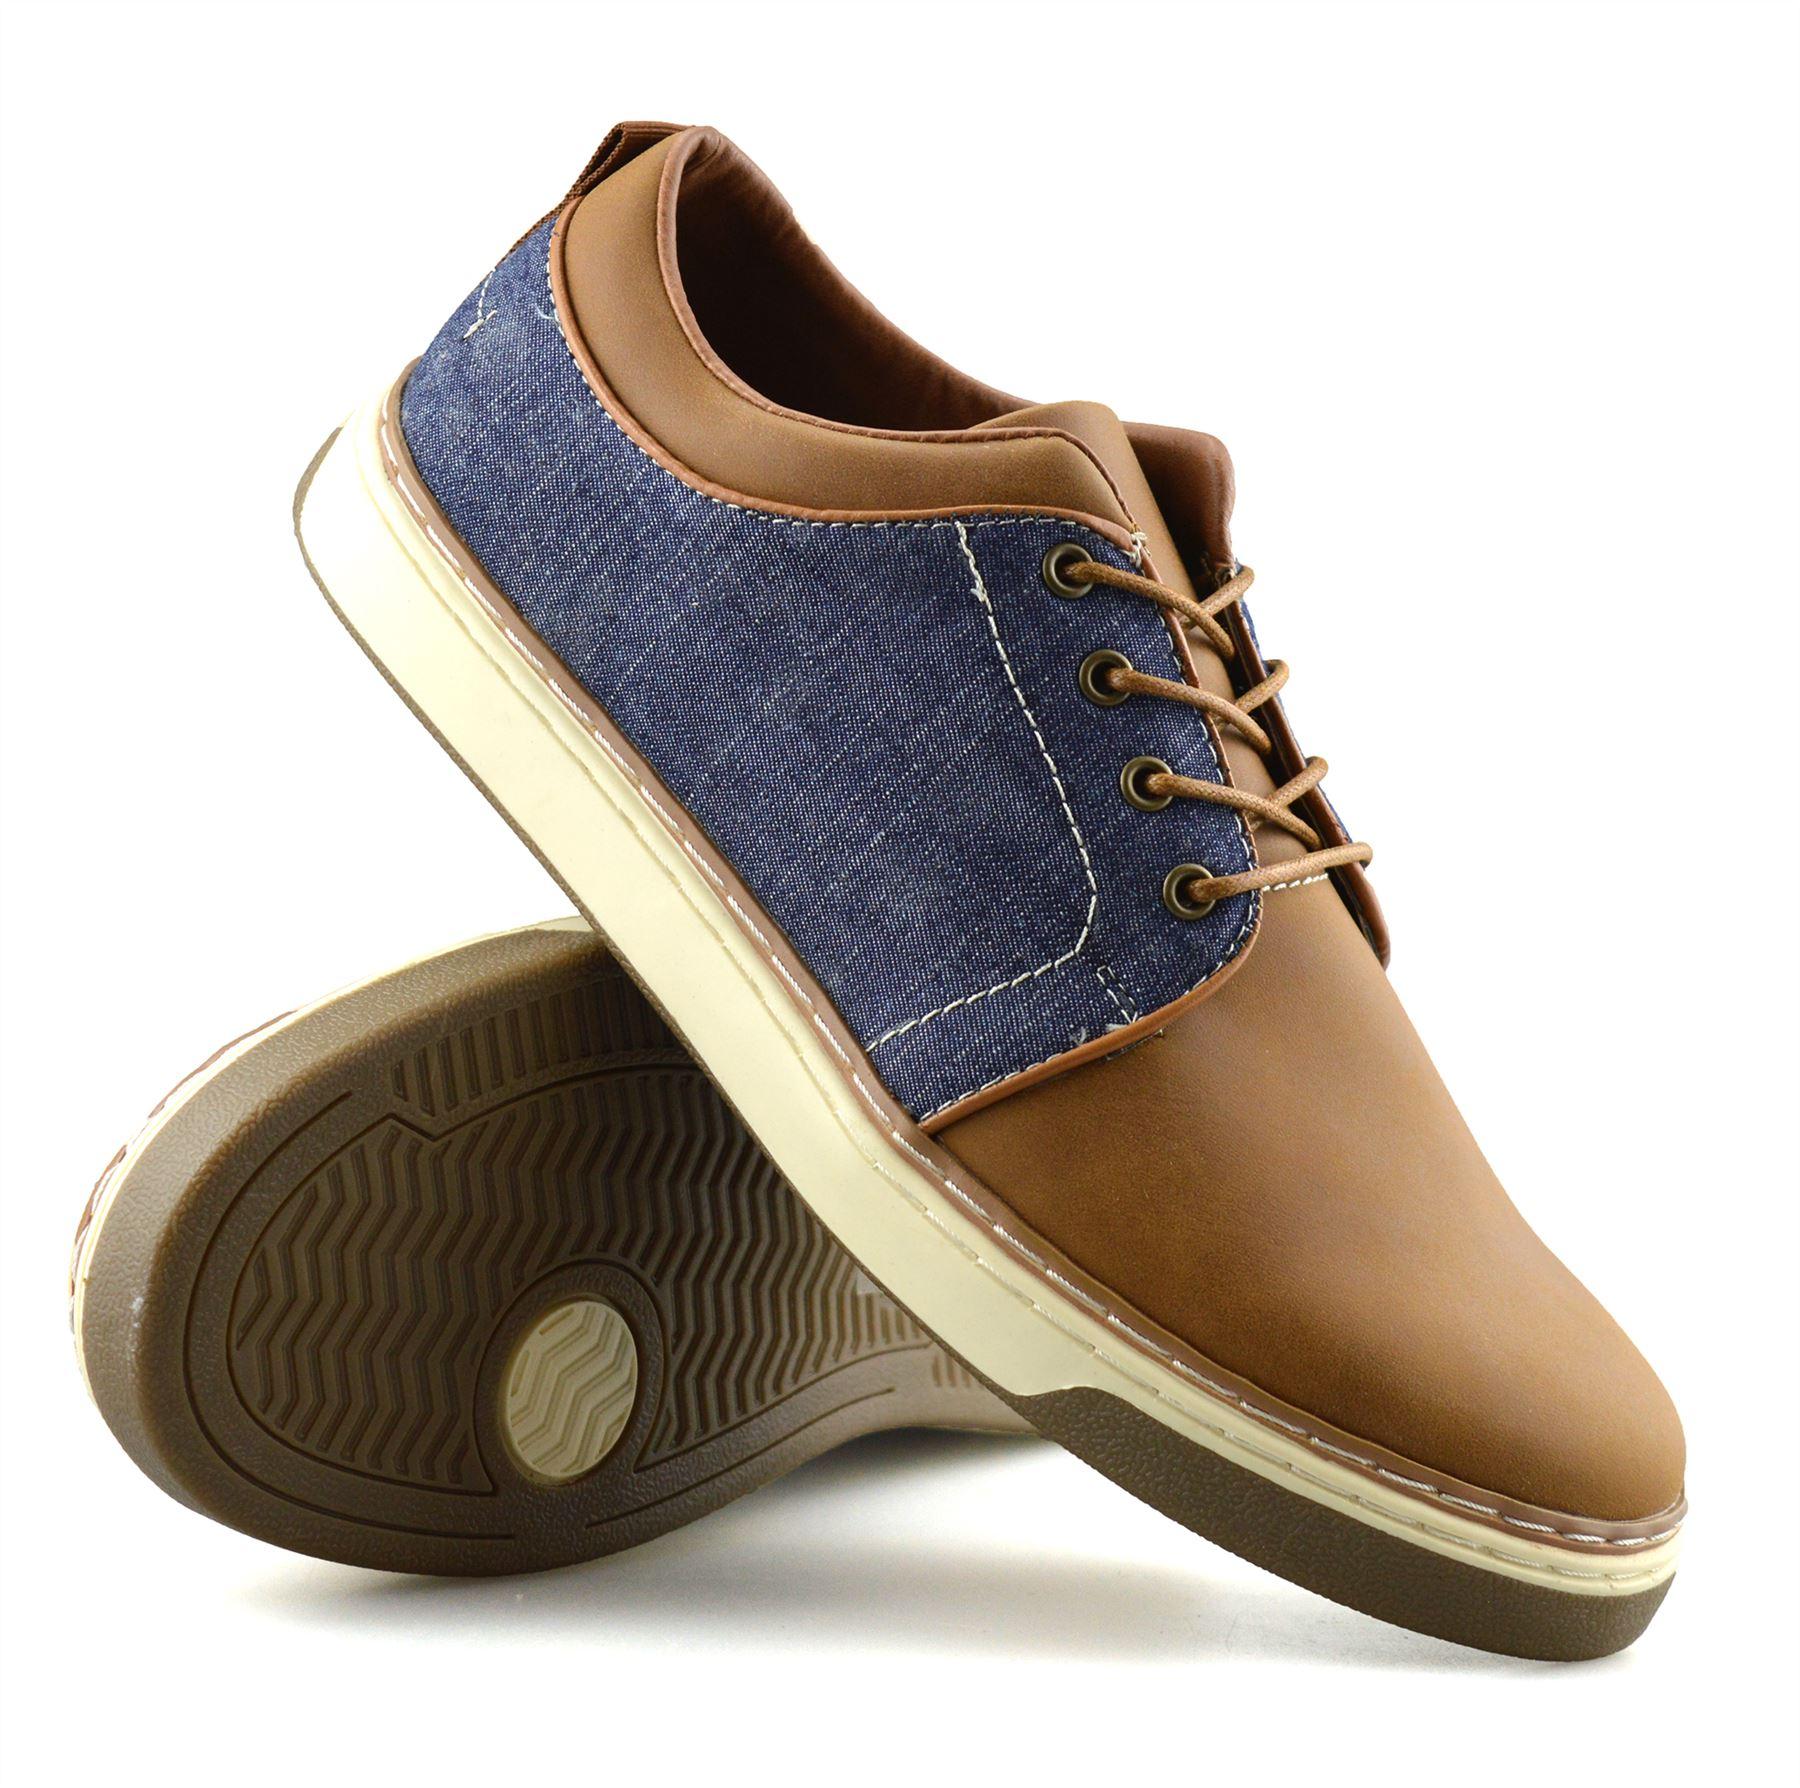 Homme-Nouveau-Casual-Smart-bateau-pont-Mocassin-Walking-Driving-Work-Lace-Up-Chaussures-Taille miniature 23